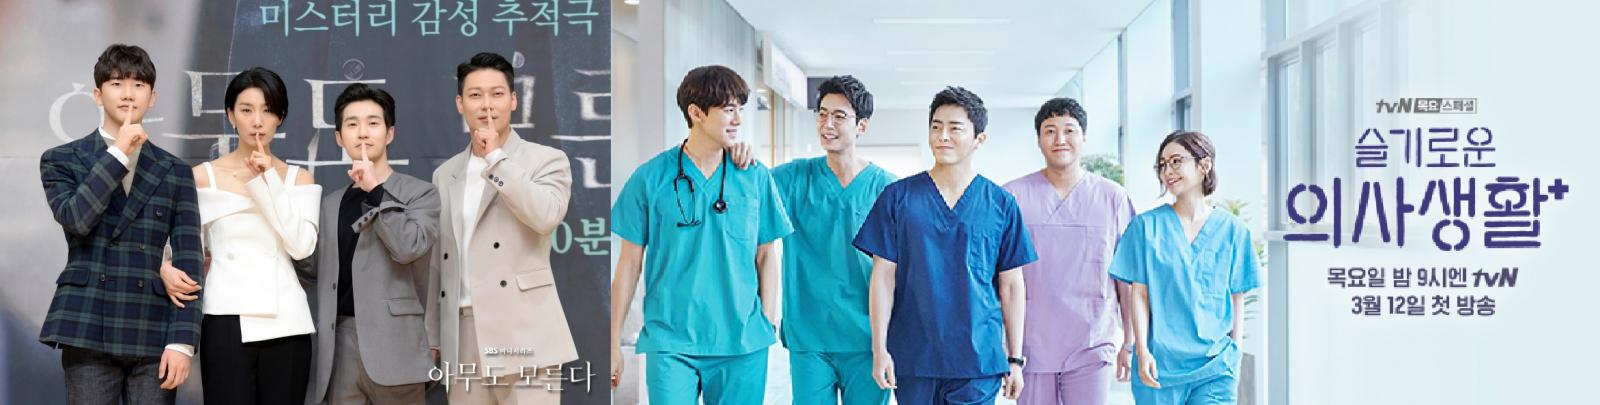 How To Watch Nobody Knows Hospital Playlist